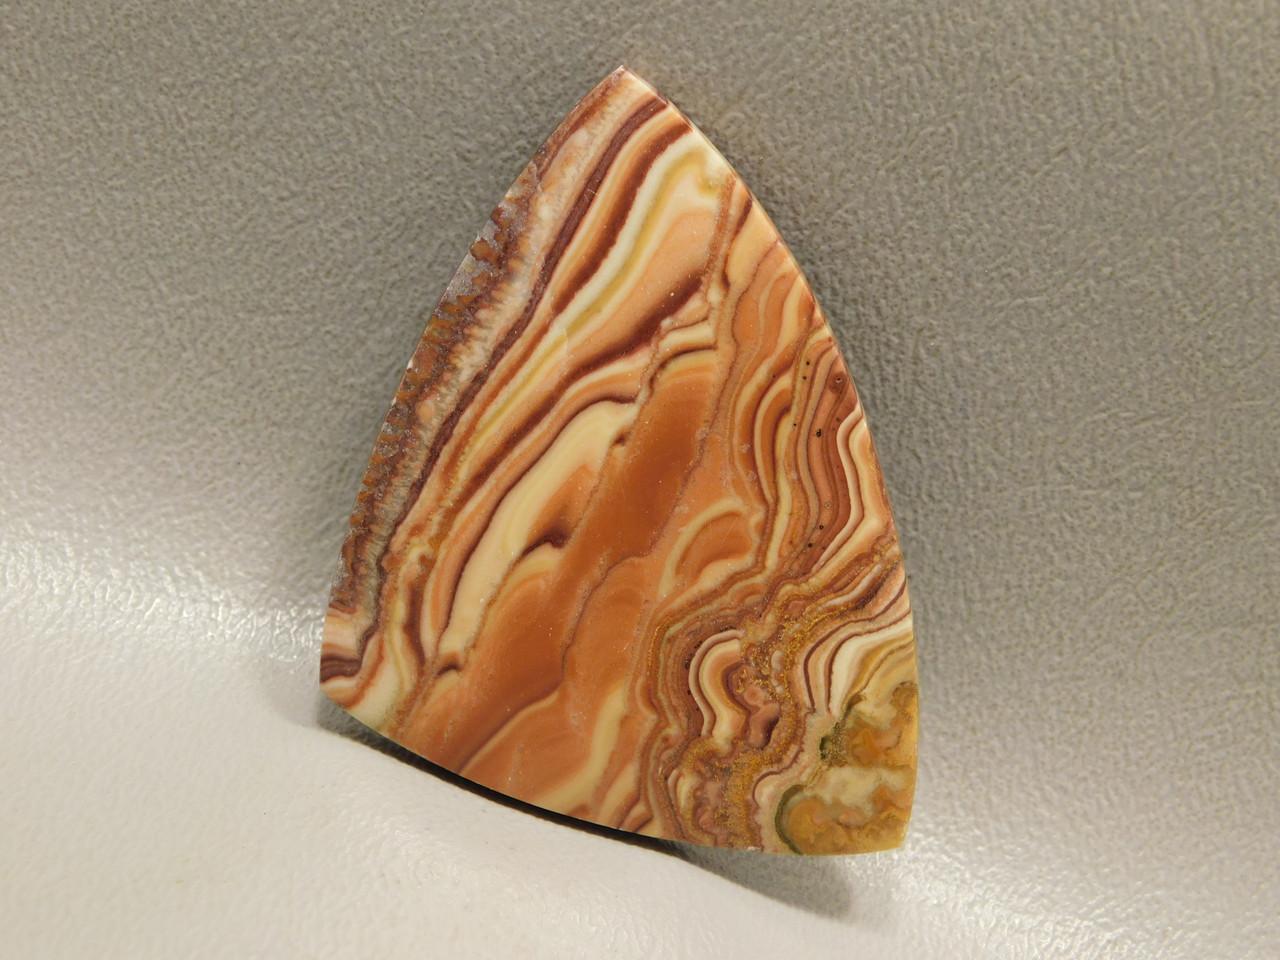 Wave Dolomite Cabochon Loose Stone Jewelry Design #11